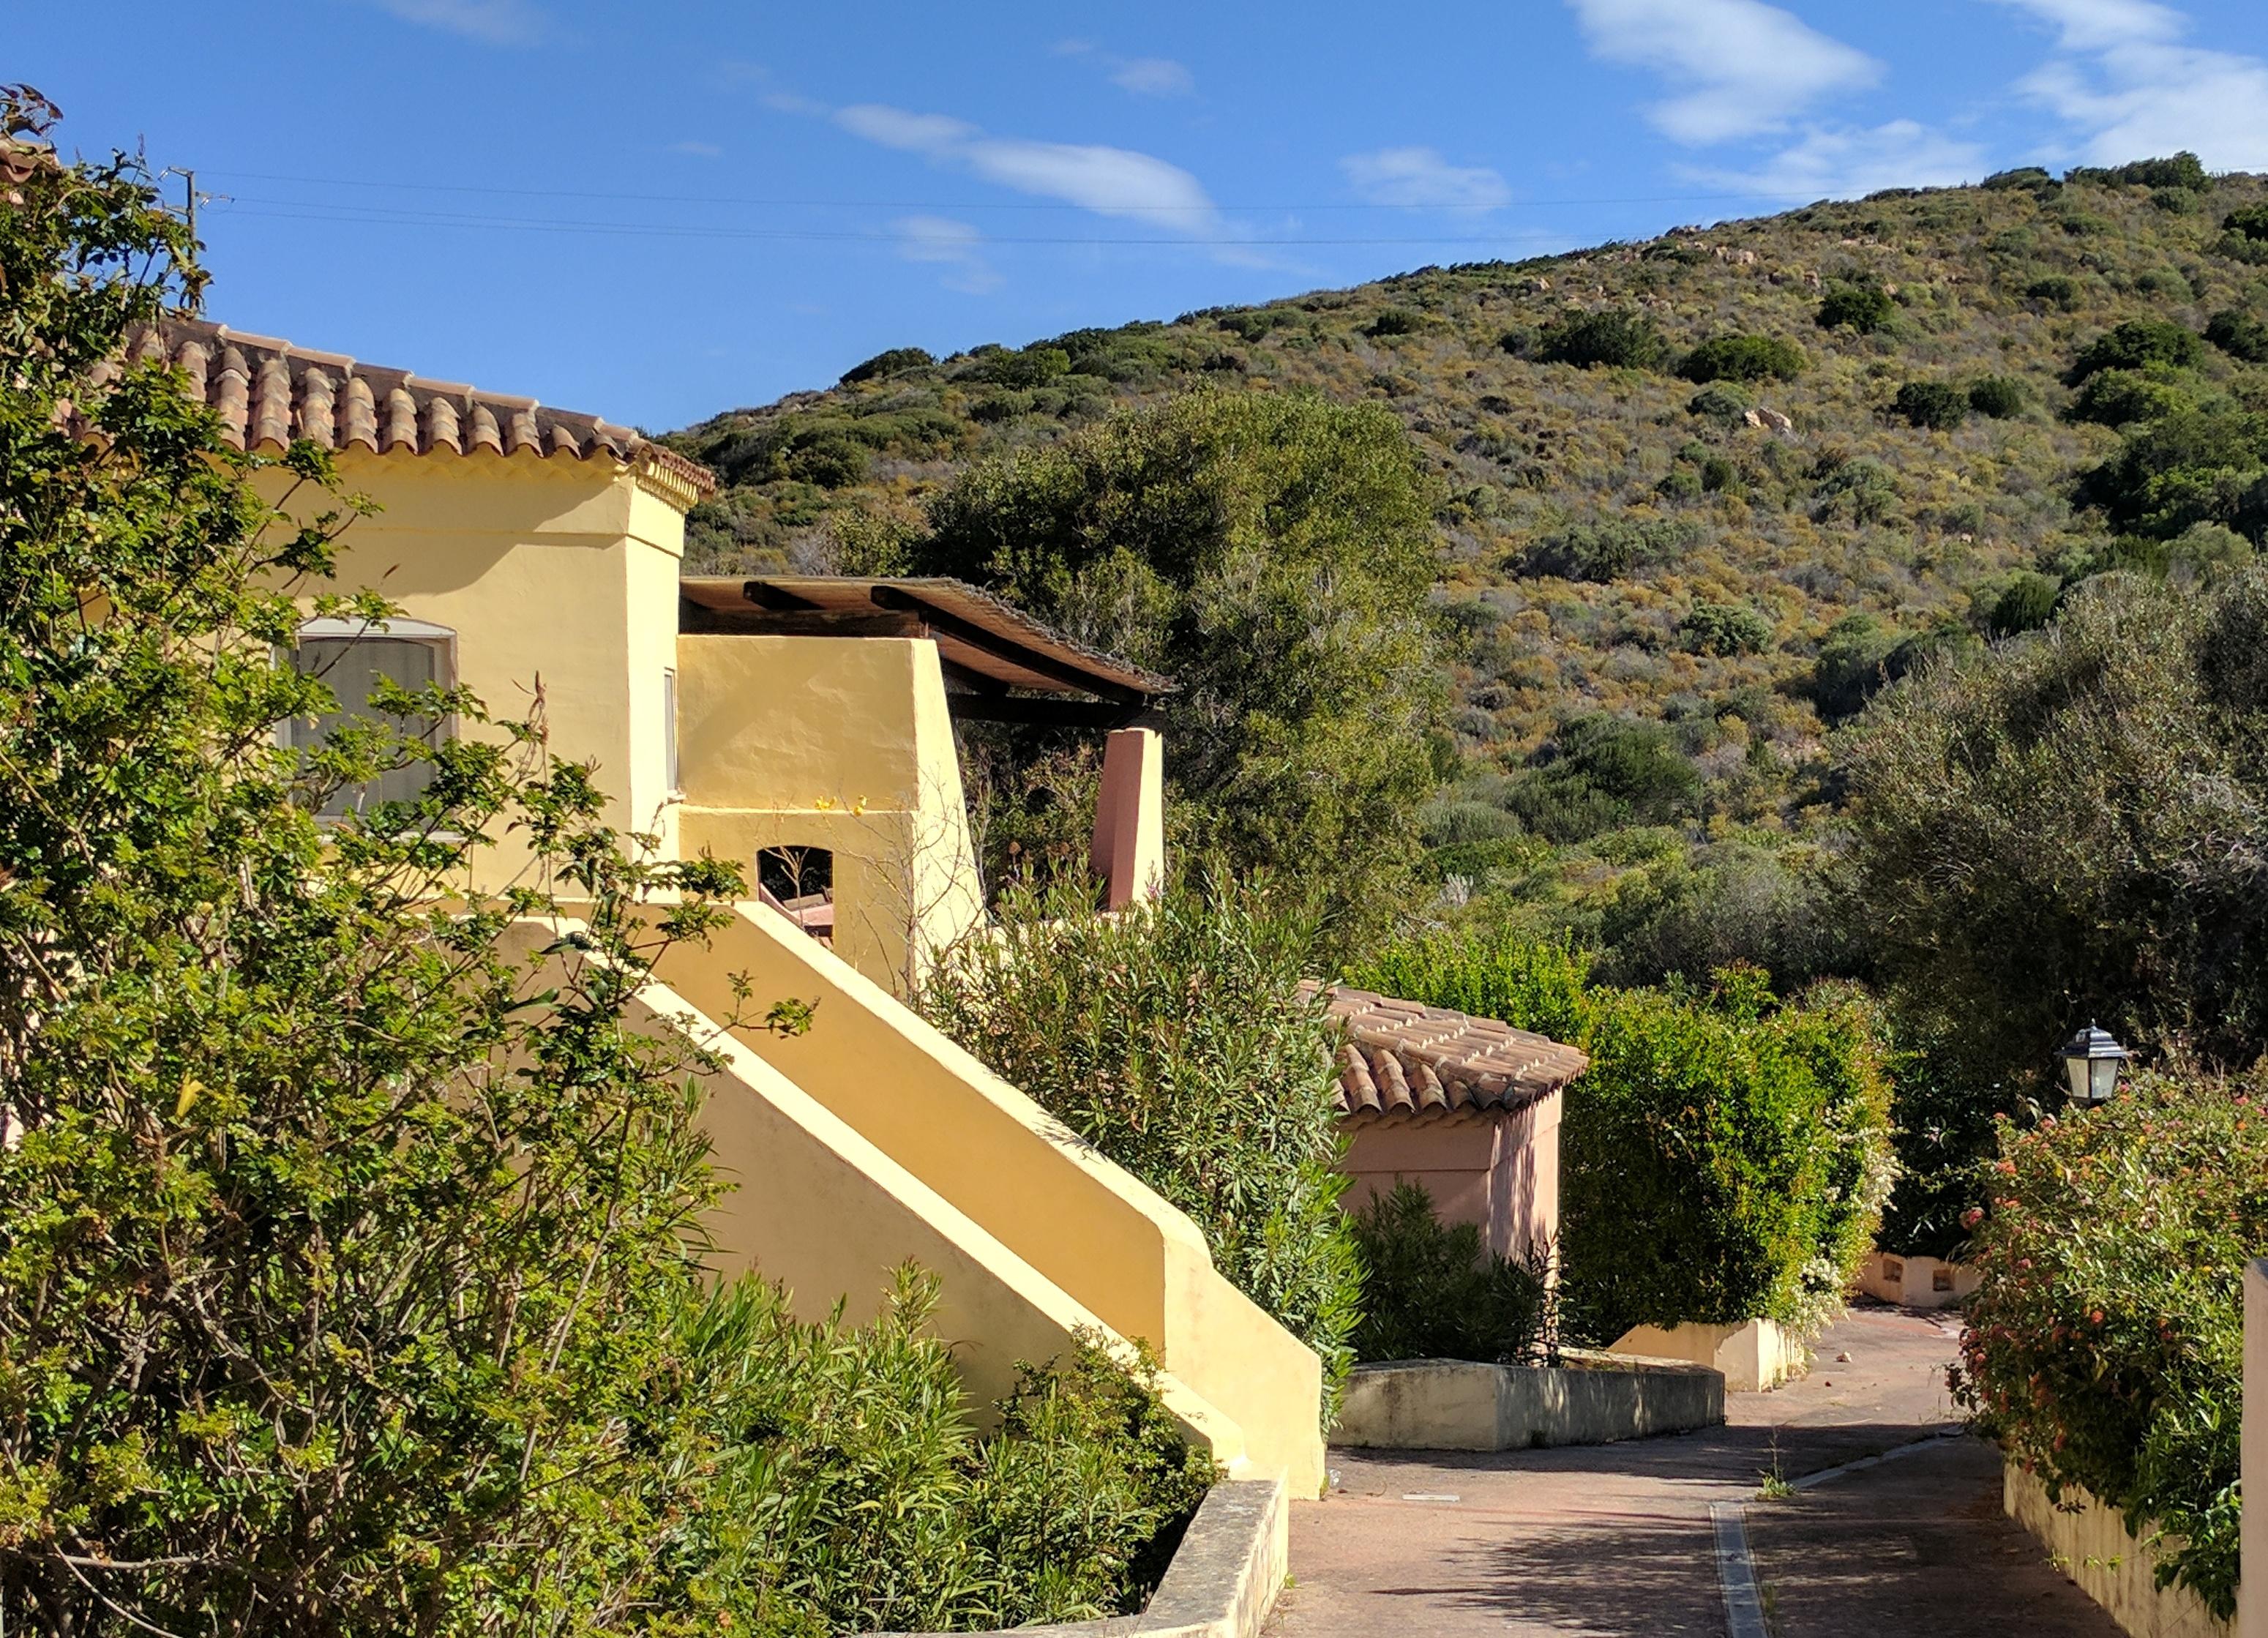 Ferienwohnung Cottage-Apartment On The Coast Surrounded By Unspoilt Nature (2230692), Canneddi, Olbia-Tempio, Sardinien, Italien, Bild 4